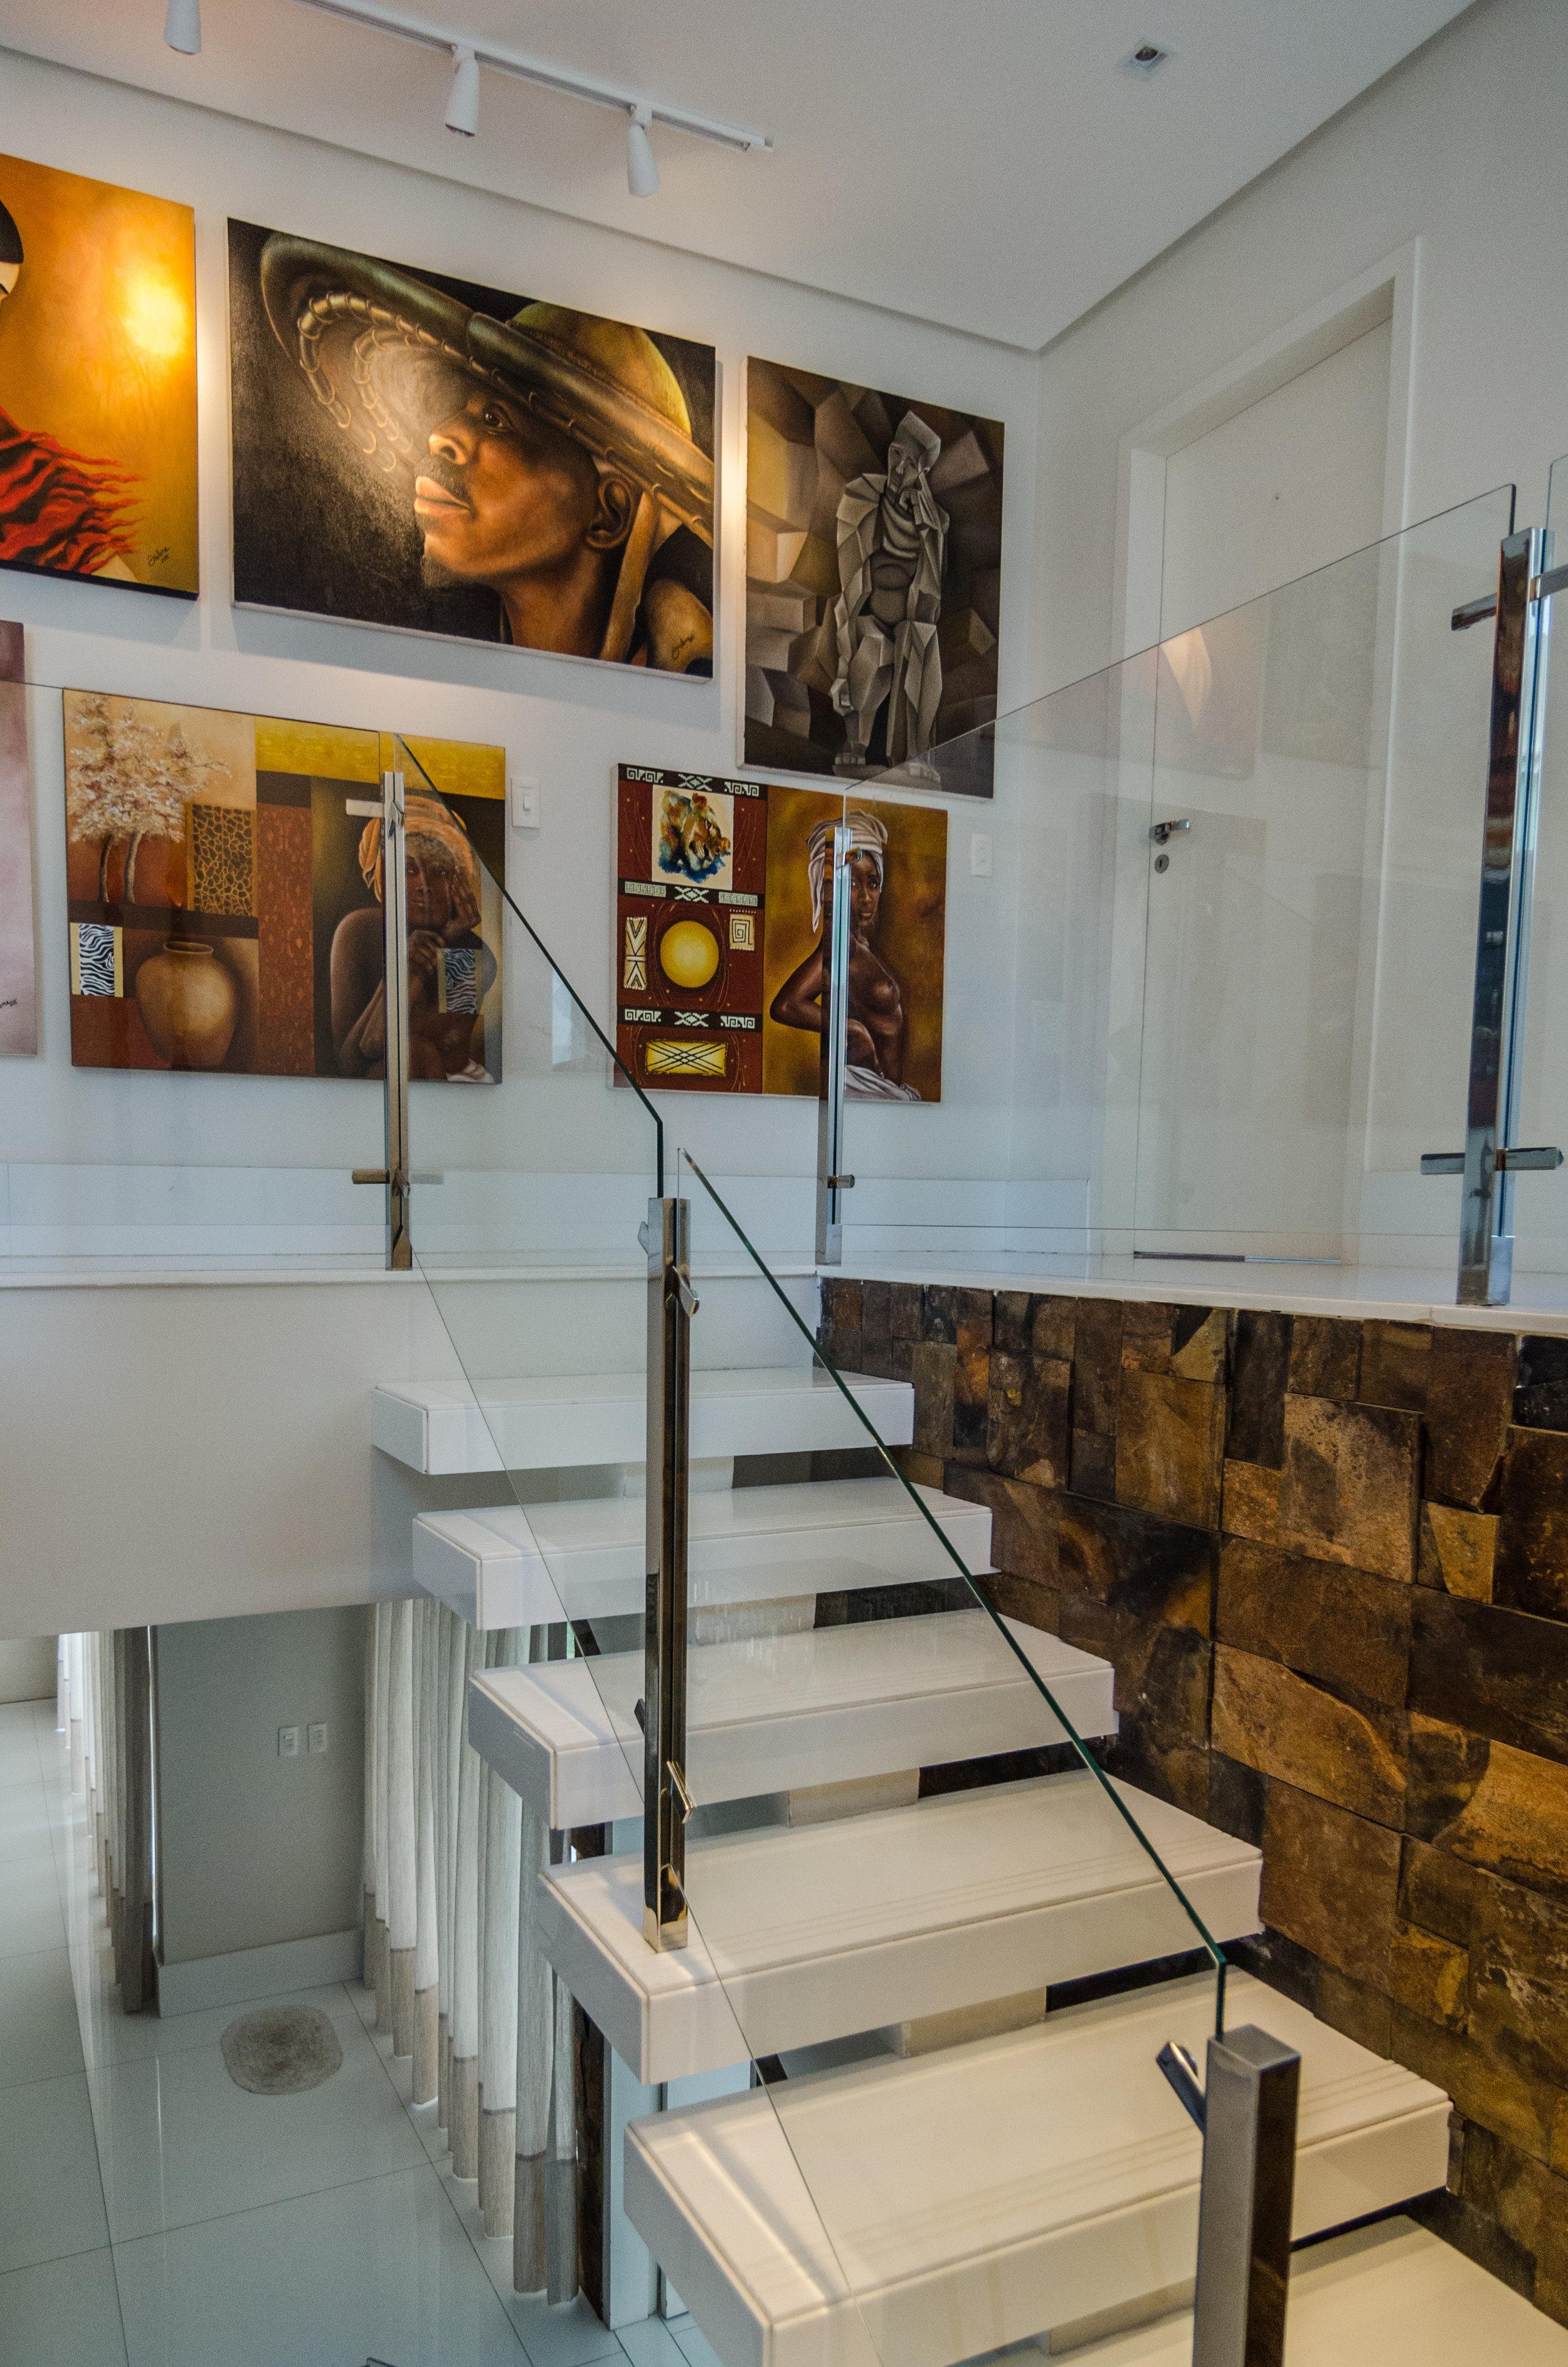 projeto-arquitetonico-alexandrepinto-duo-arquitetura-casa-014.jpg